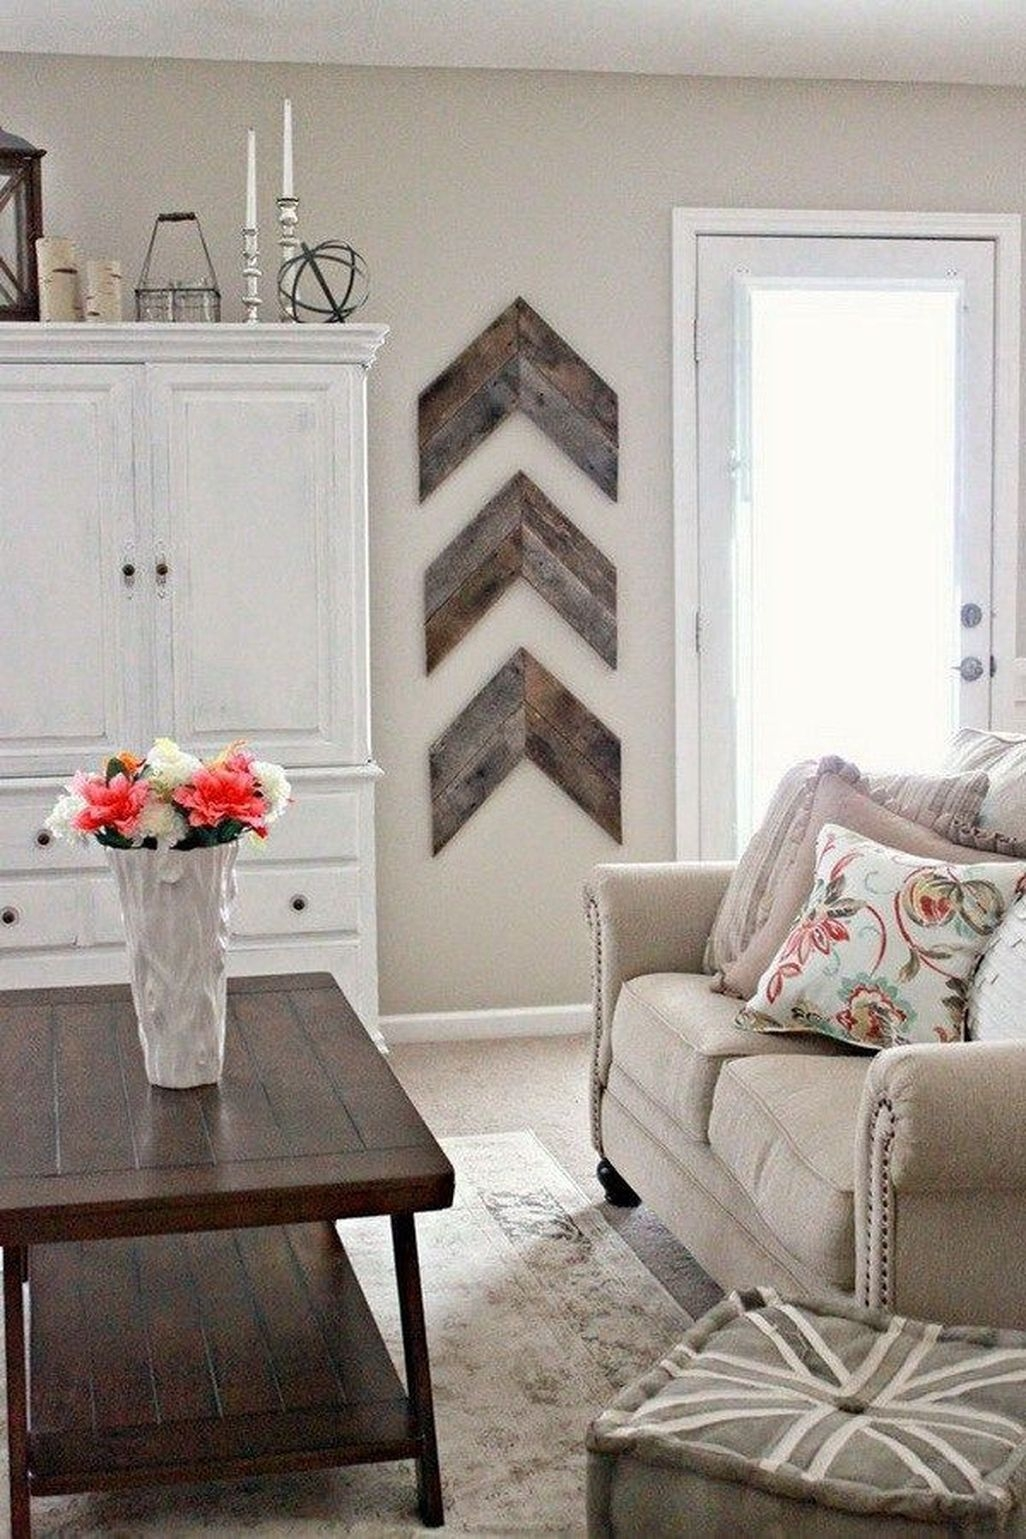 Creative Diy Wooden Home Decorations Ideas 36